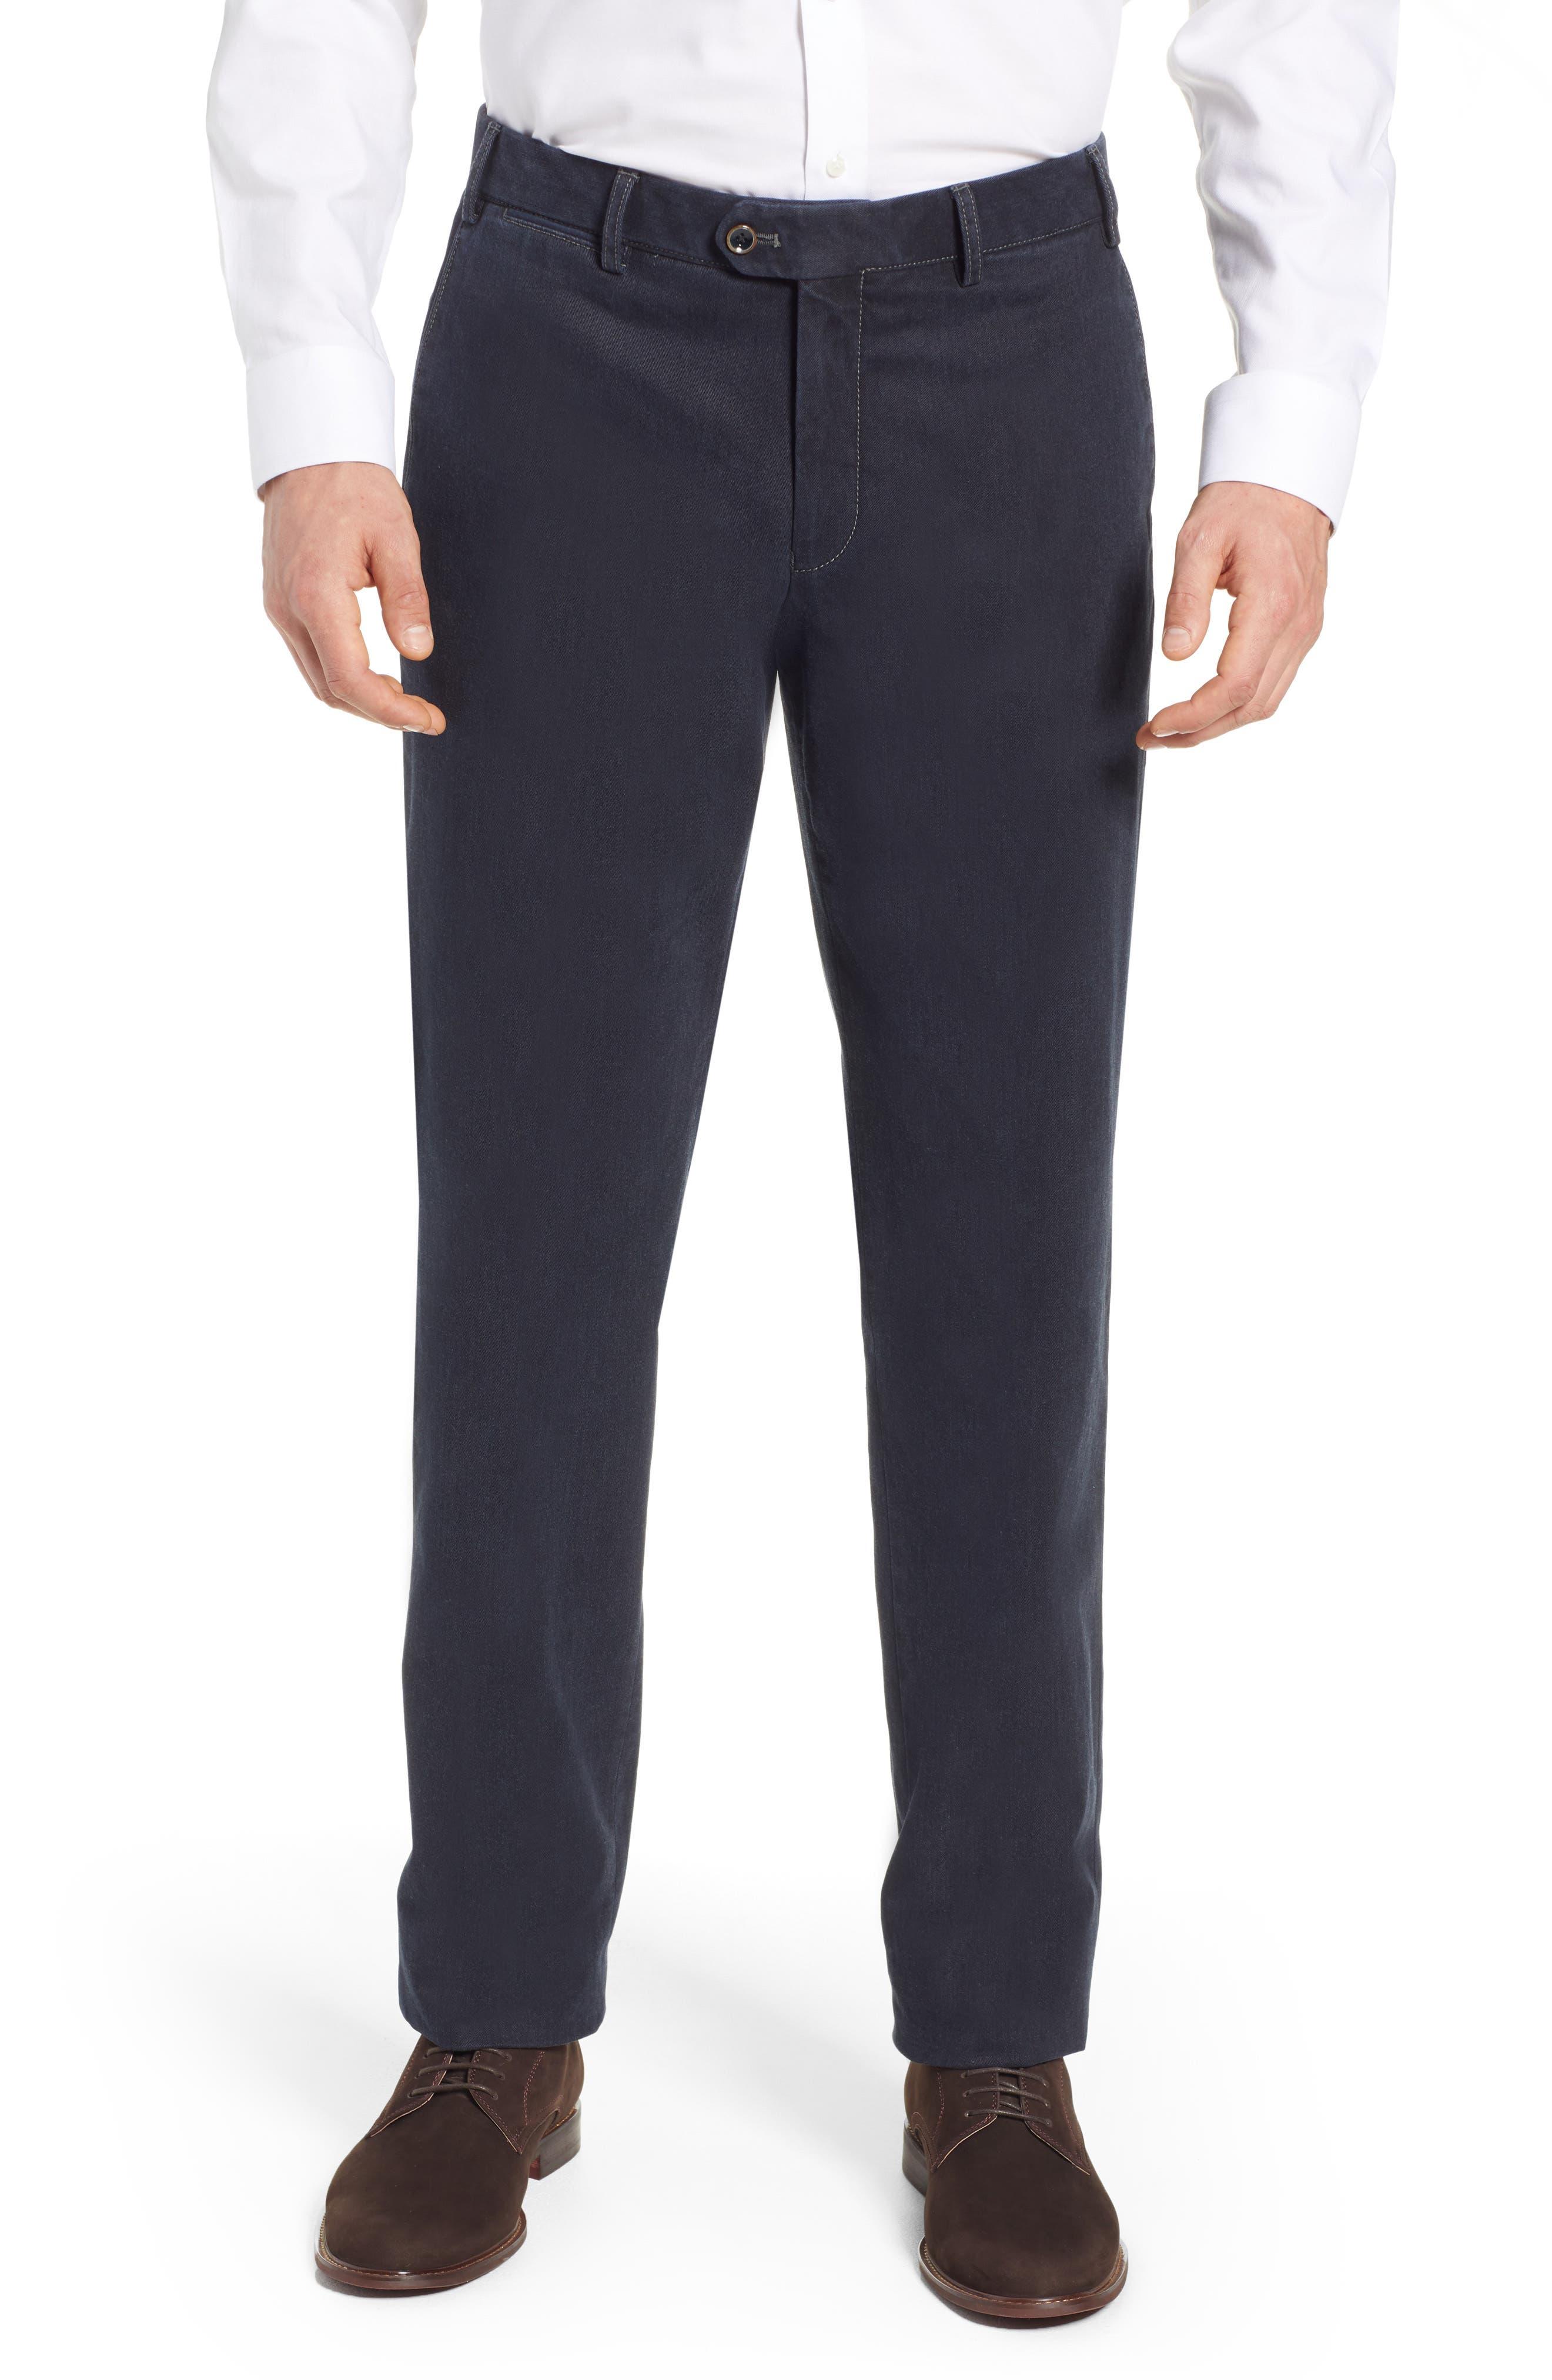 Pero Trim Fit Stretch Flat Front Cotton Blend Trousers,                         Main,                         color, CHARCOAL